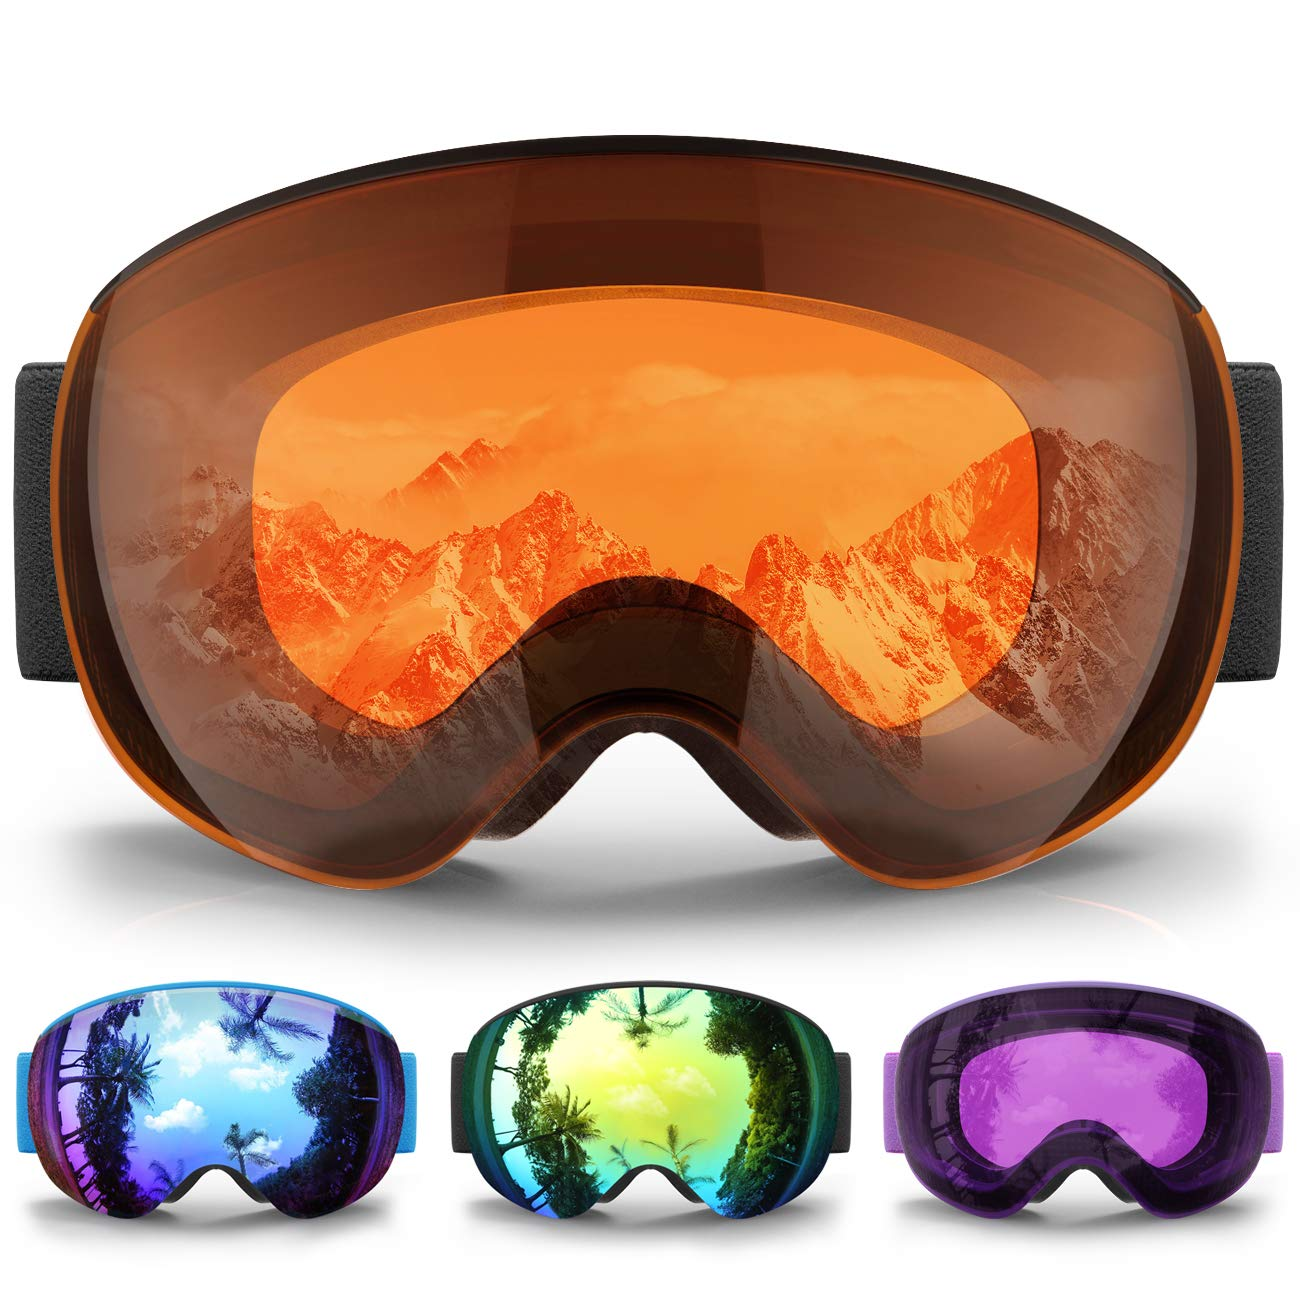 eDriveTech Masque de Ski Homme Femme, Lunette Masque Ski Lunettes de Ski  pour Homme Femme e1af2b4883ac